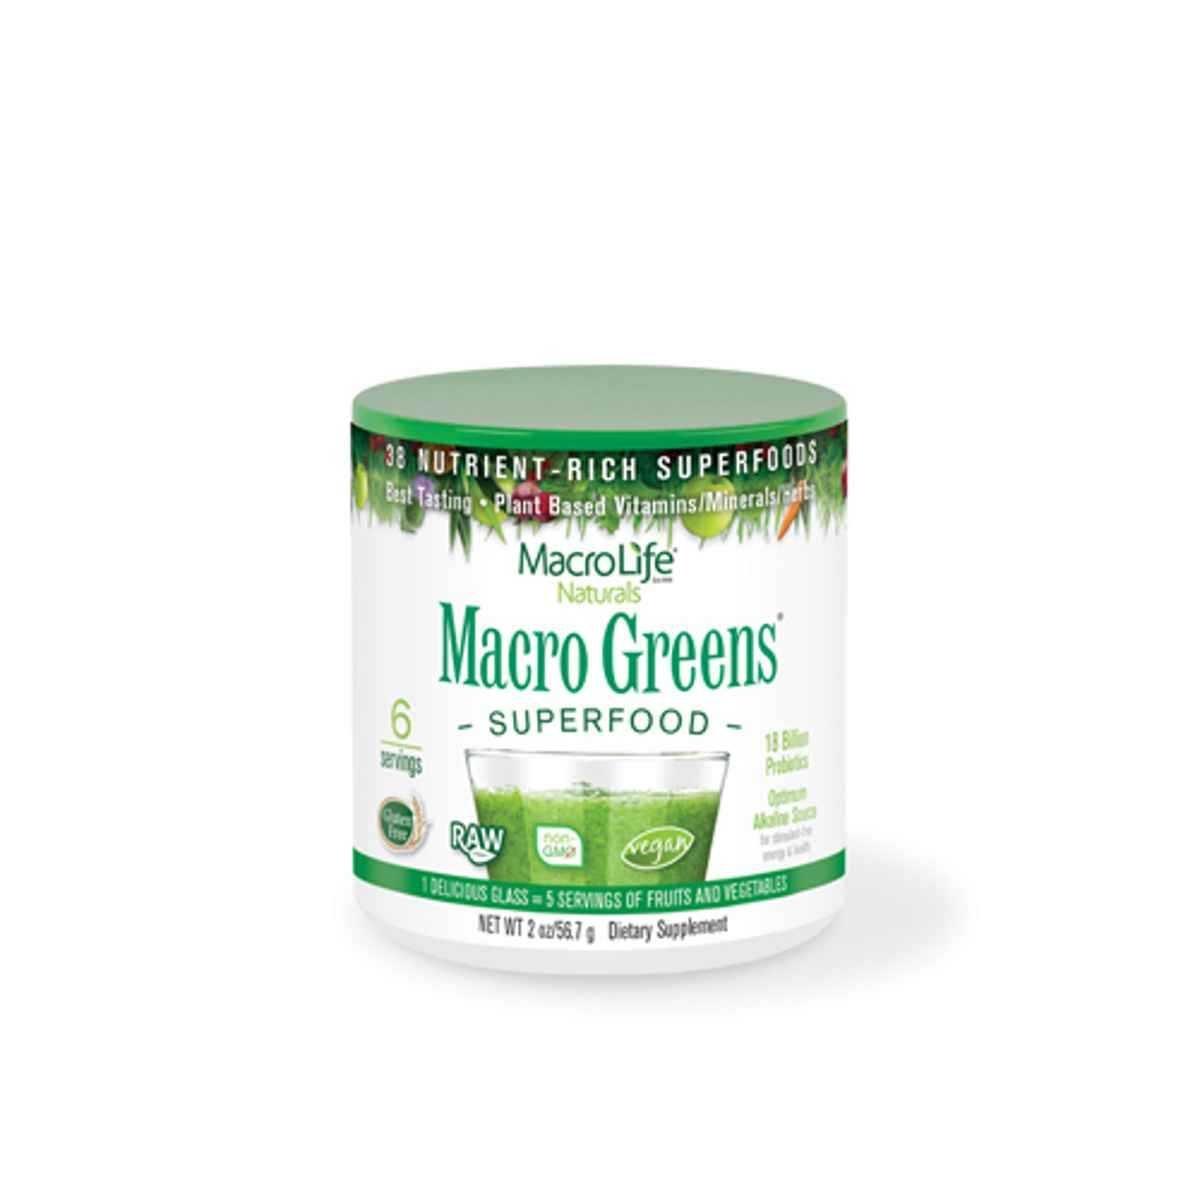 Amazon.com: Macrolife Naturals Raw Superfood Macro verdes, 6 ...